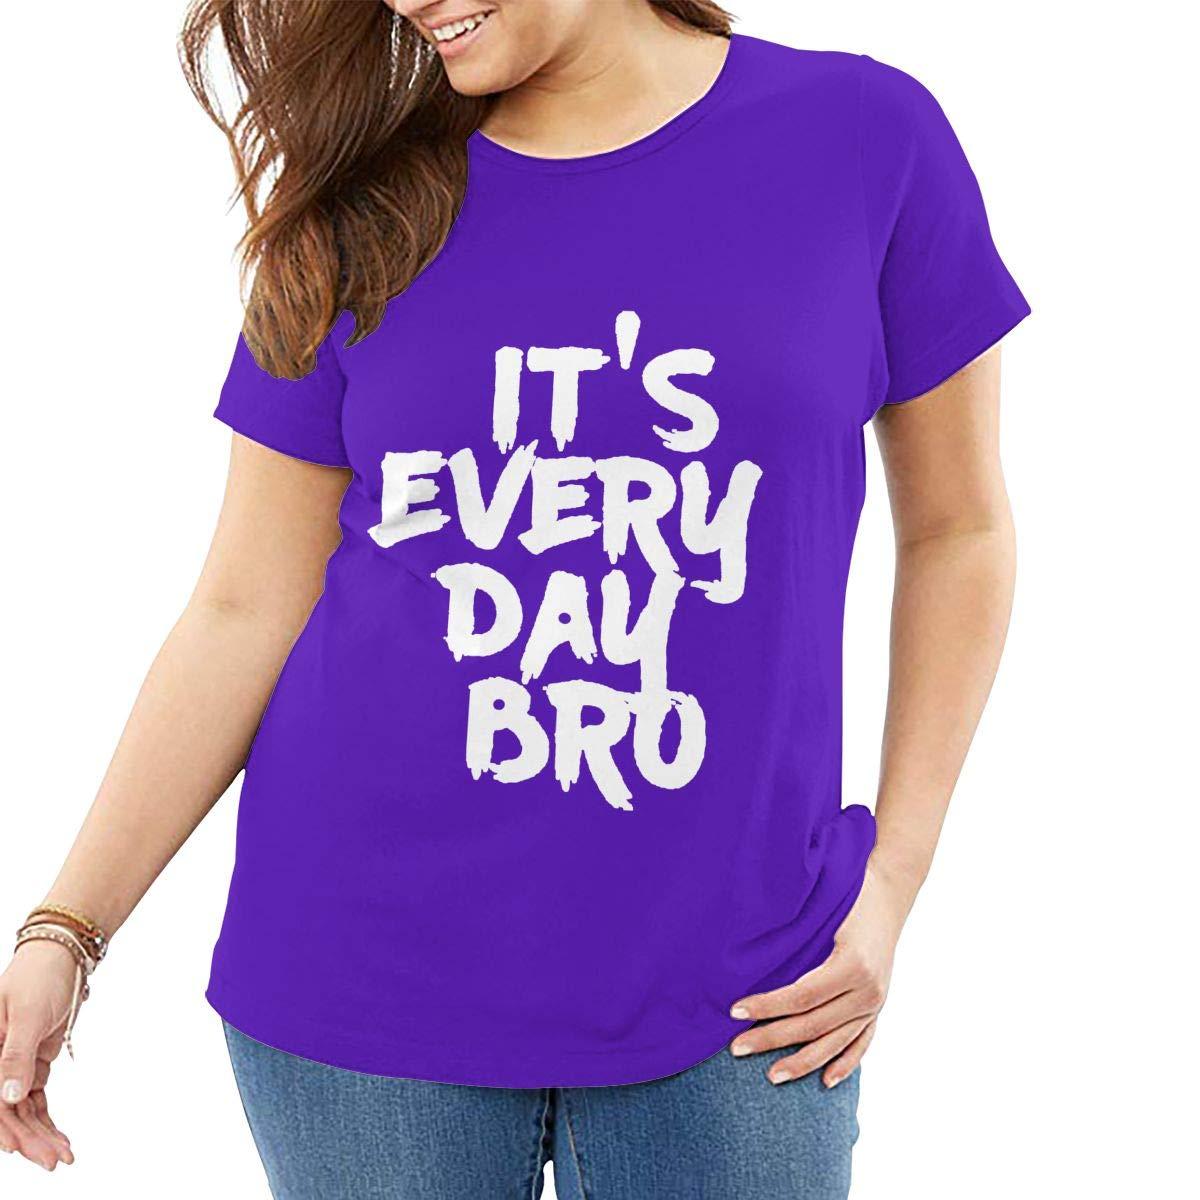 Fat Women's T Shirt Jake Paul It's Every Day BRO Tee Shirts T-Shirt Short-Sleeve Round Neck Tshirt for Women Girls Purple XXL by BKashy